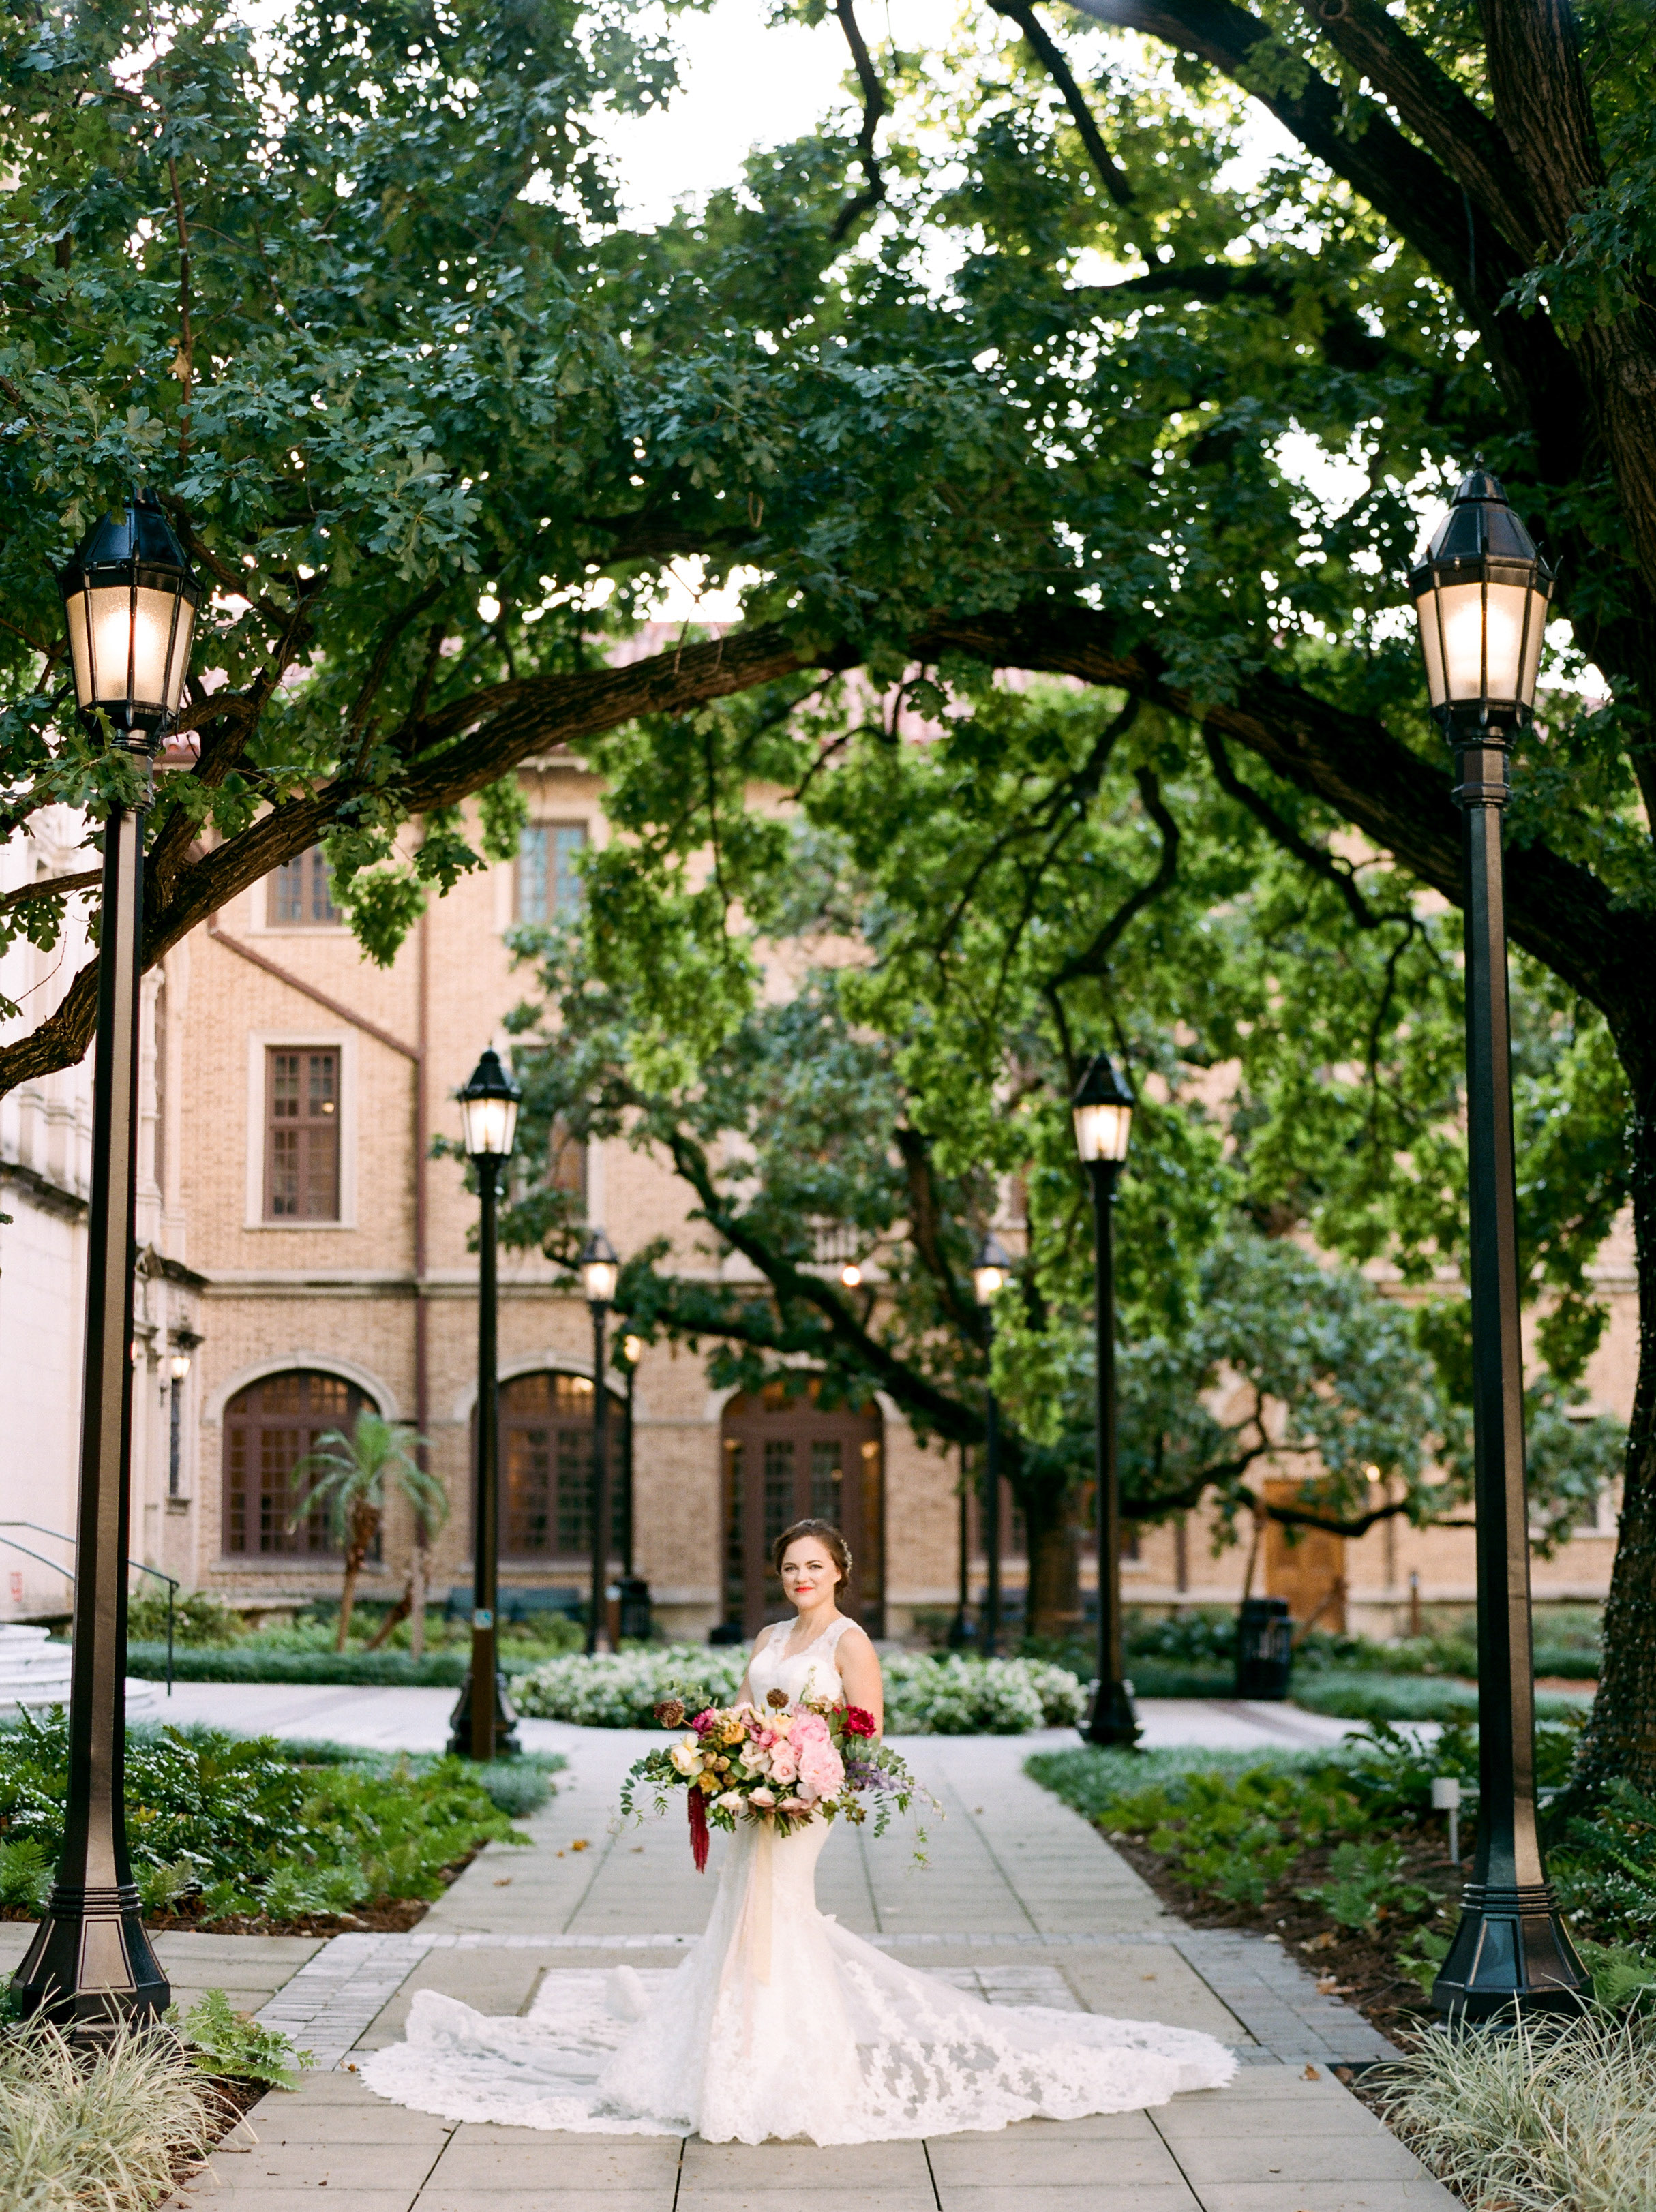 The-Knot-Texas-Fine-Art-Wedding-Film-Destination-Photographer-Houston-Austin-Dallas-New-Orleans-Julia-Ideson-Library-Event-Dana-Josh-Fernandez-Photograph-Top-Best-21.jpg